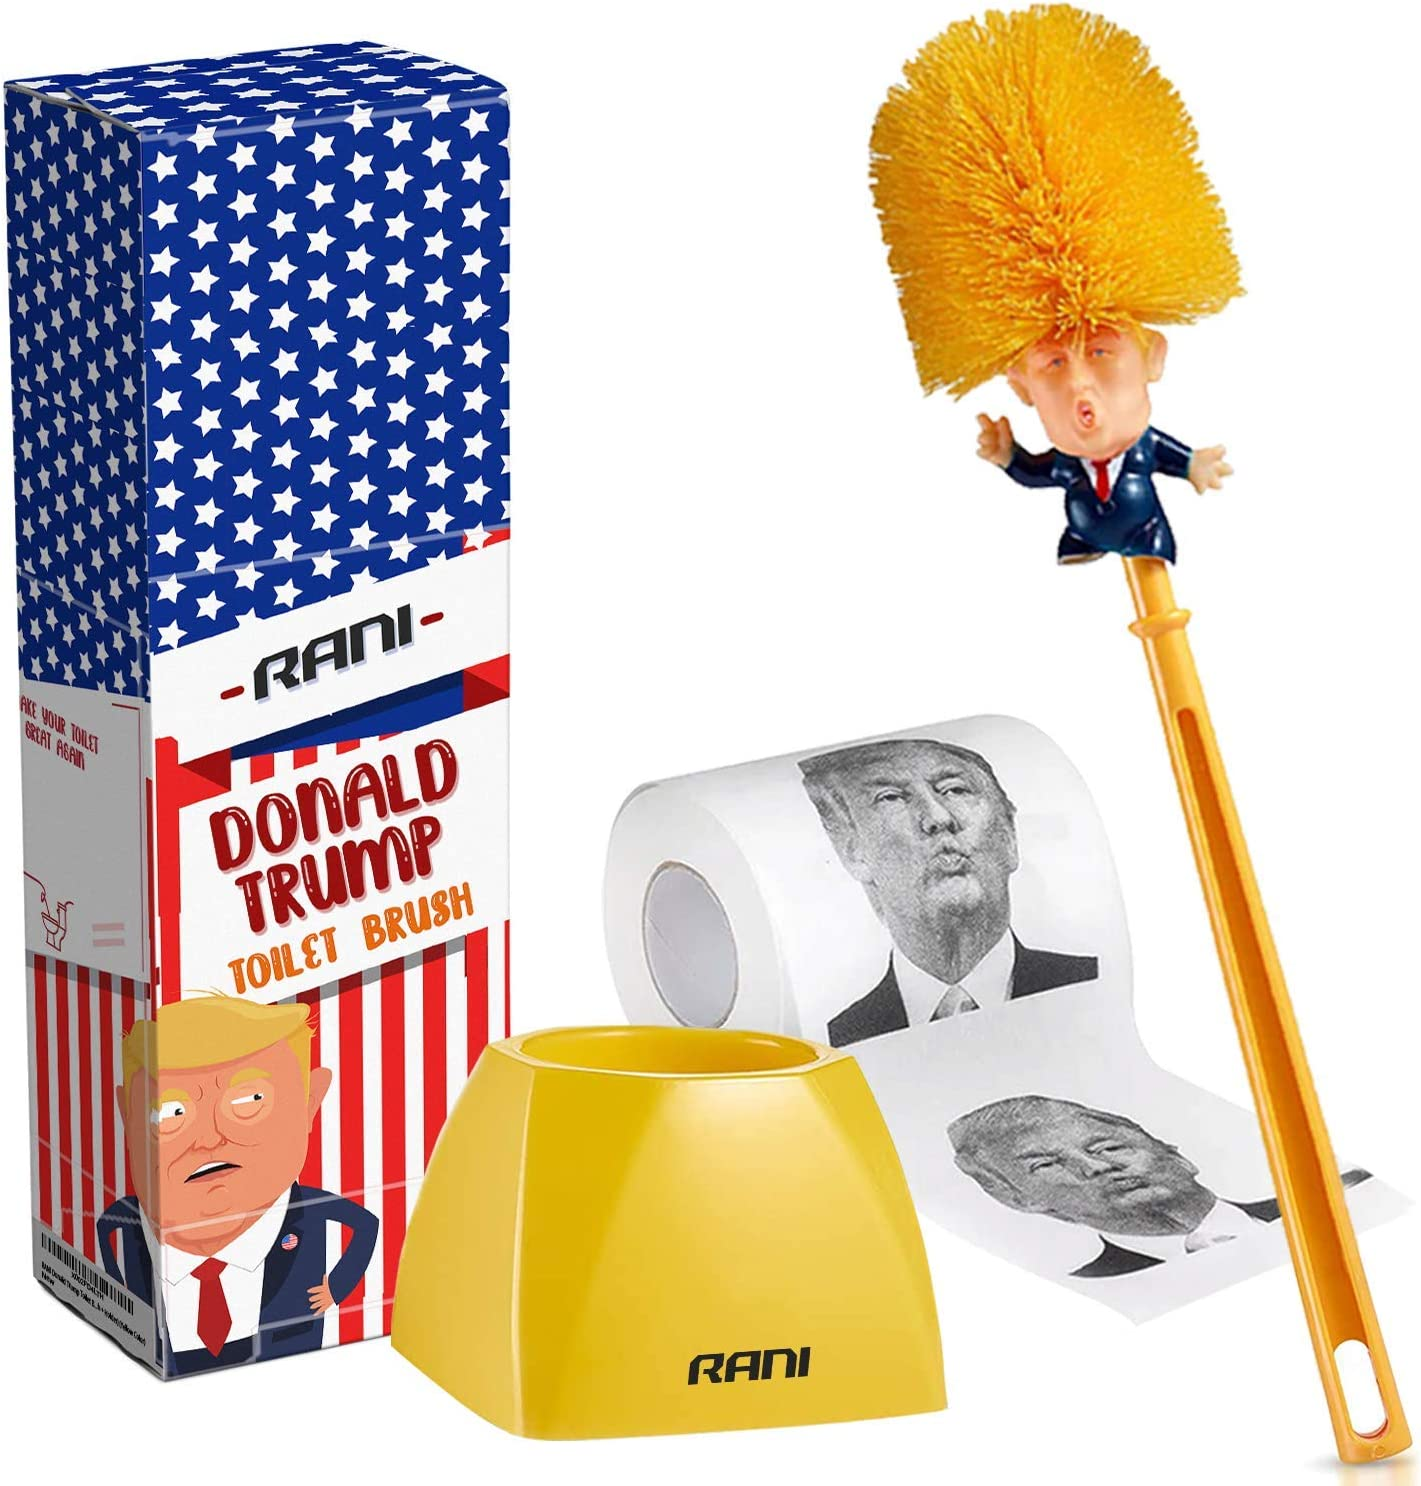 Bathroom Donald Trump Toilet Bowl Brush Gag Wash Toilet Brush Home Newe LrJNE